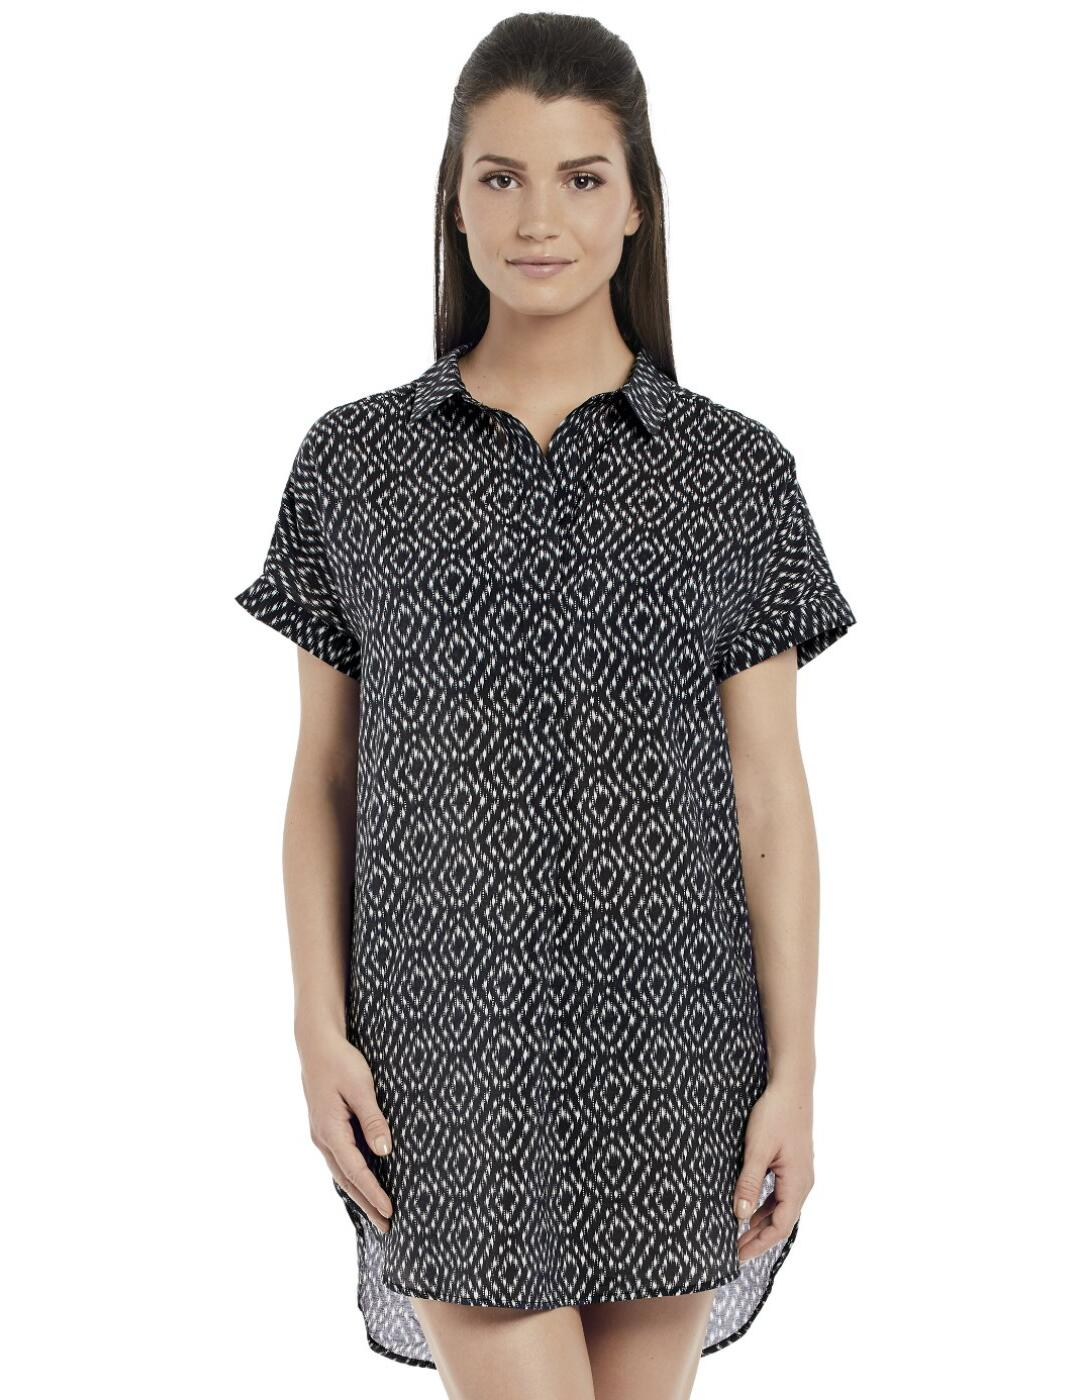 6445 Fantasie Byron Bay Shirt Beach Dress - 6445 Black/Cream